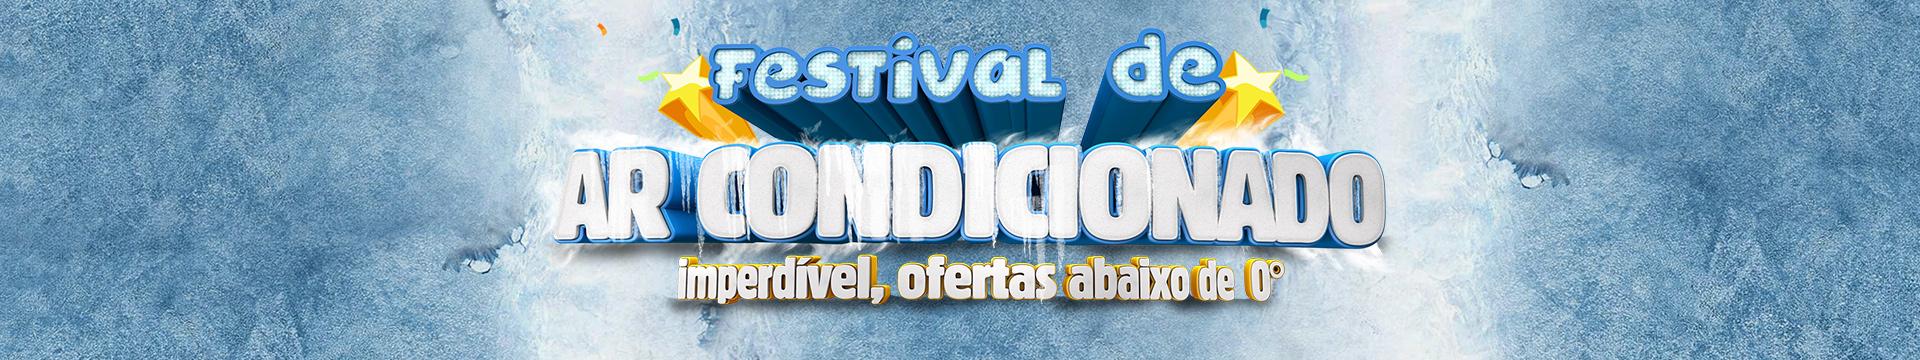 Festival ar condicionado - Capa